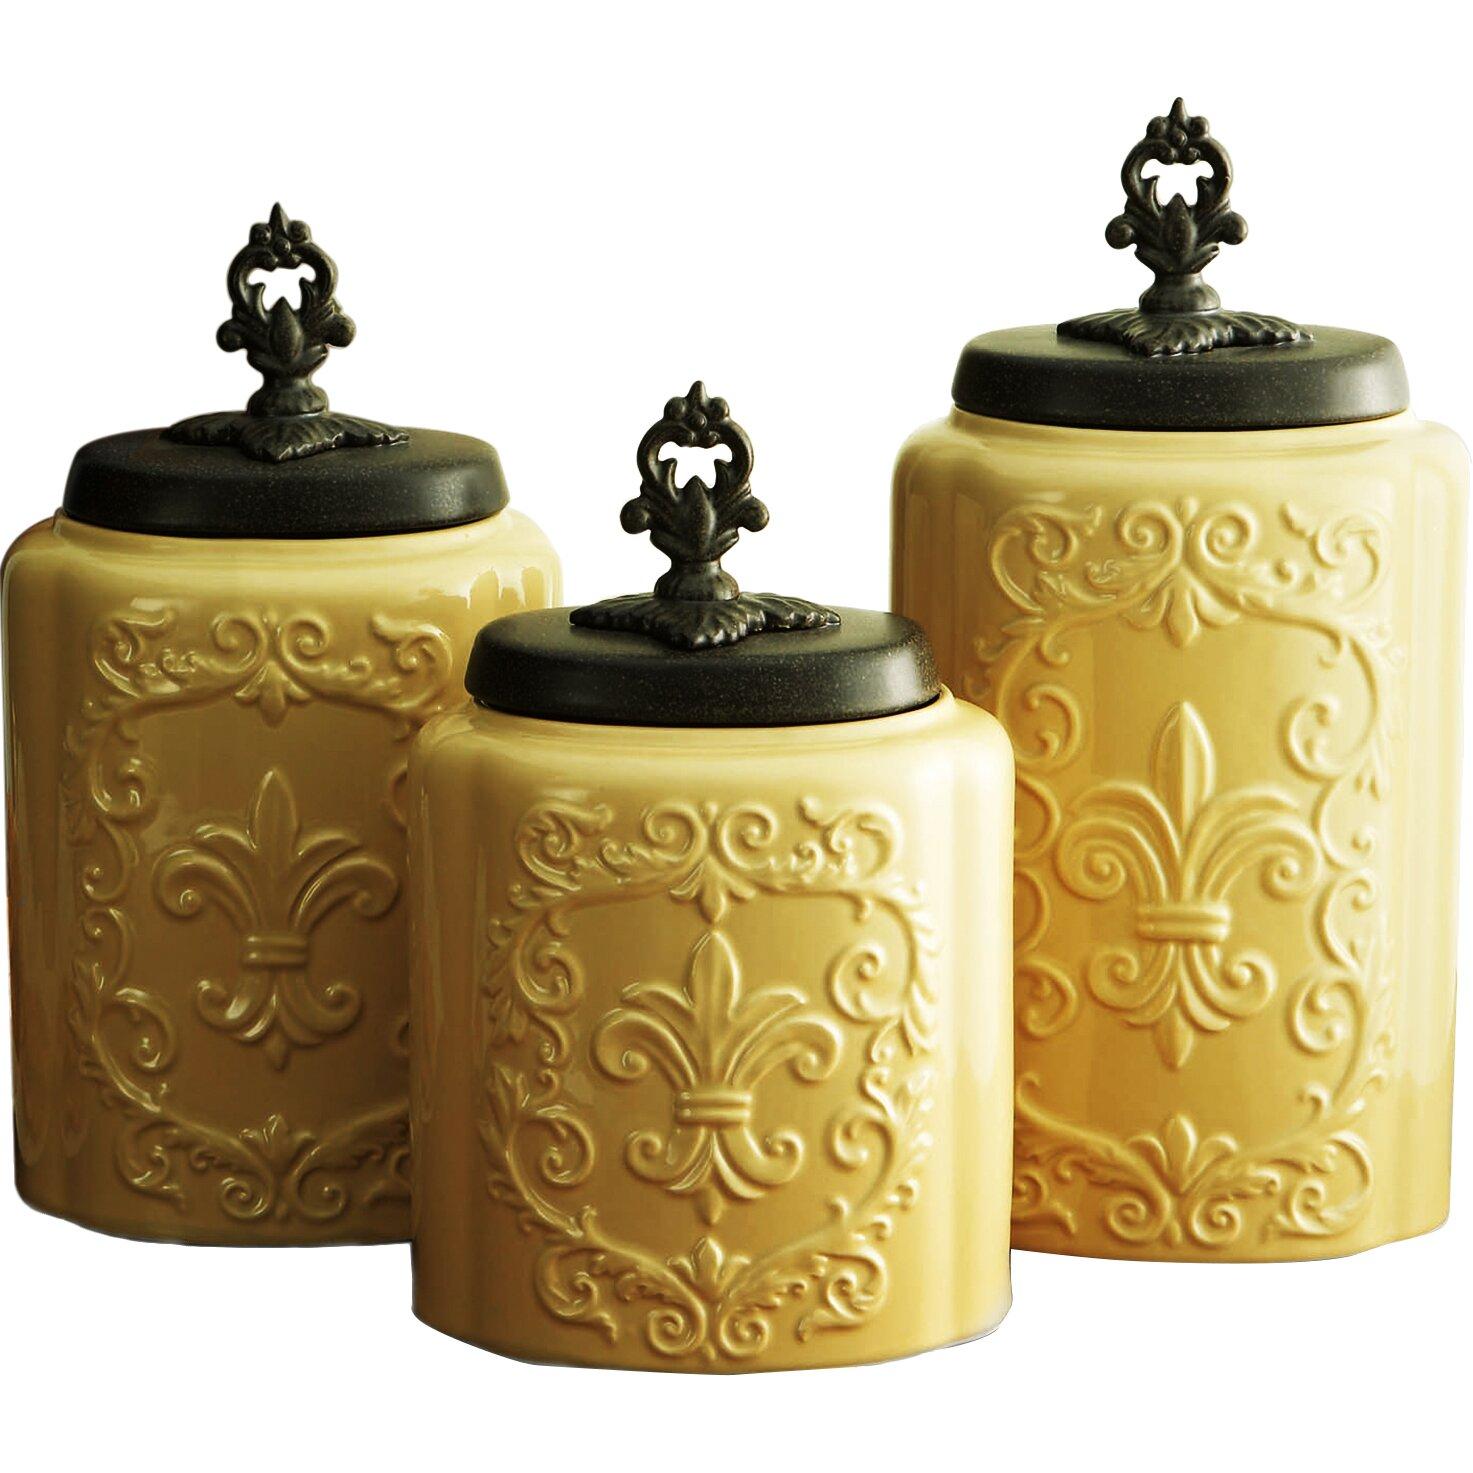 28 3 piece kitchen canister set vonshef 3 piece kitchen 3 piece kitchen canister set design guild 3 piece canister set amp reviews wayfair